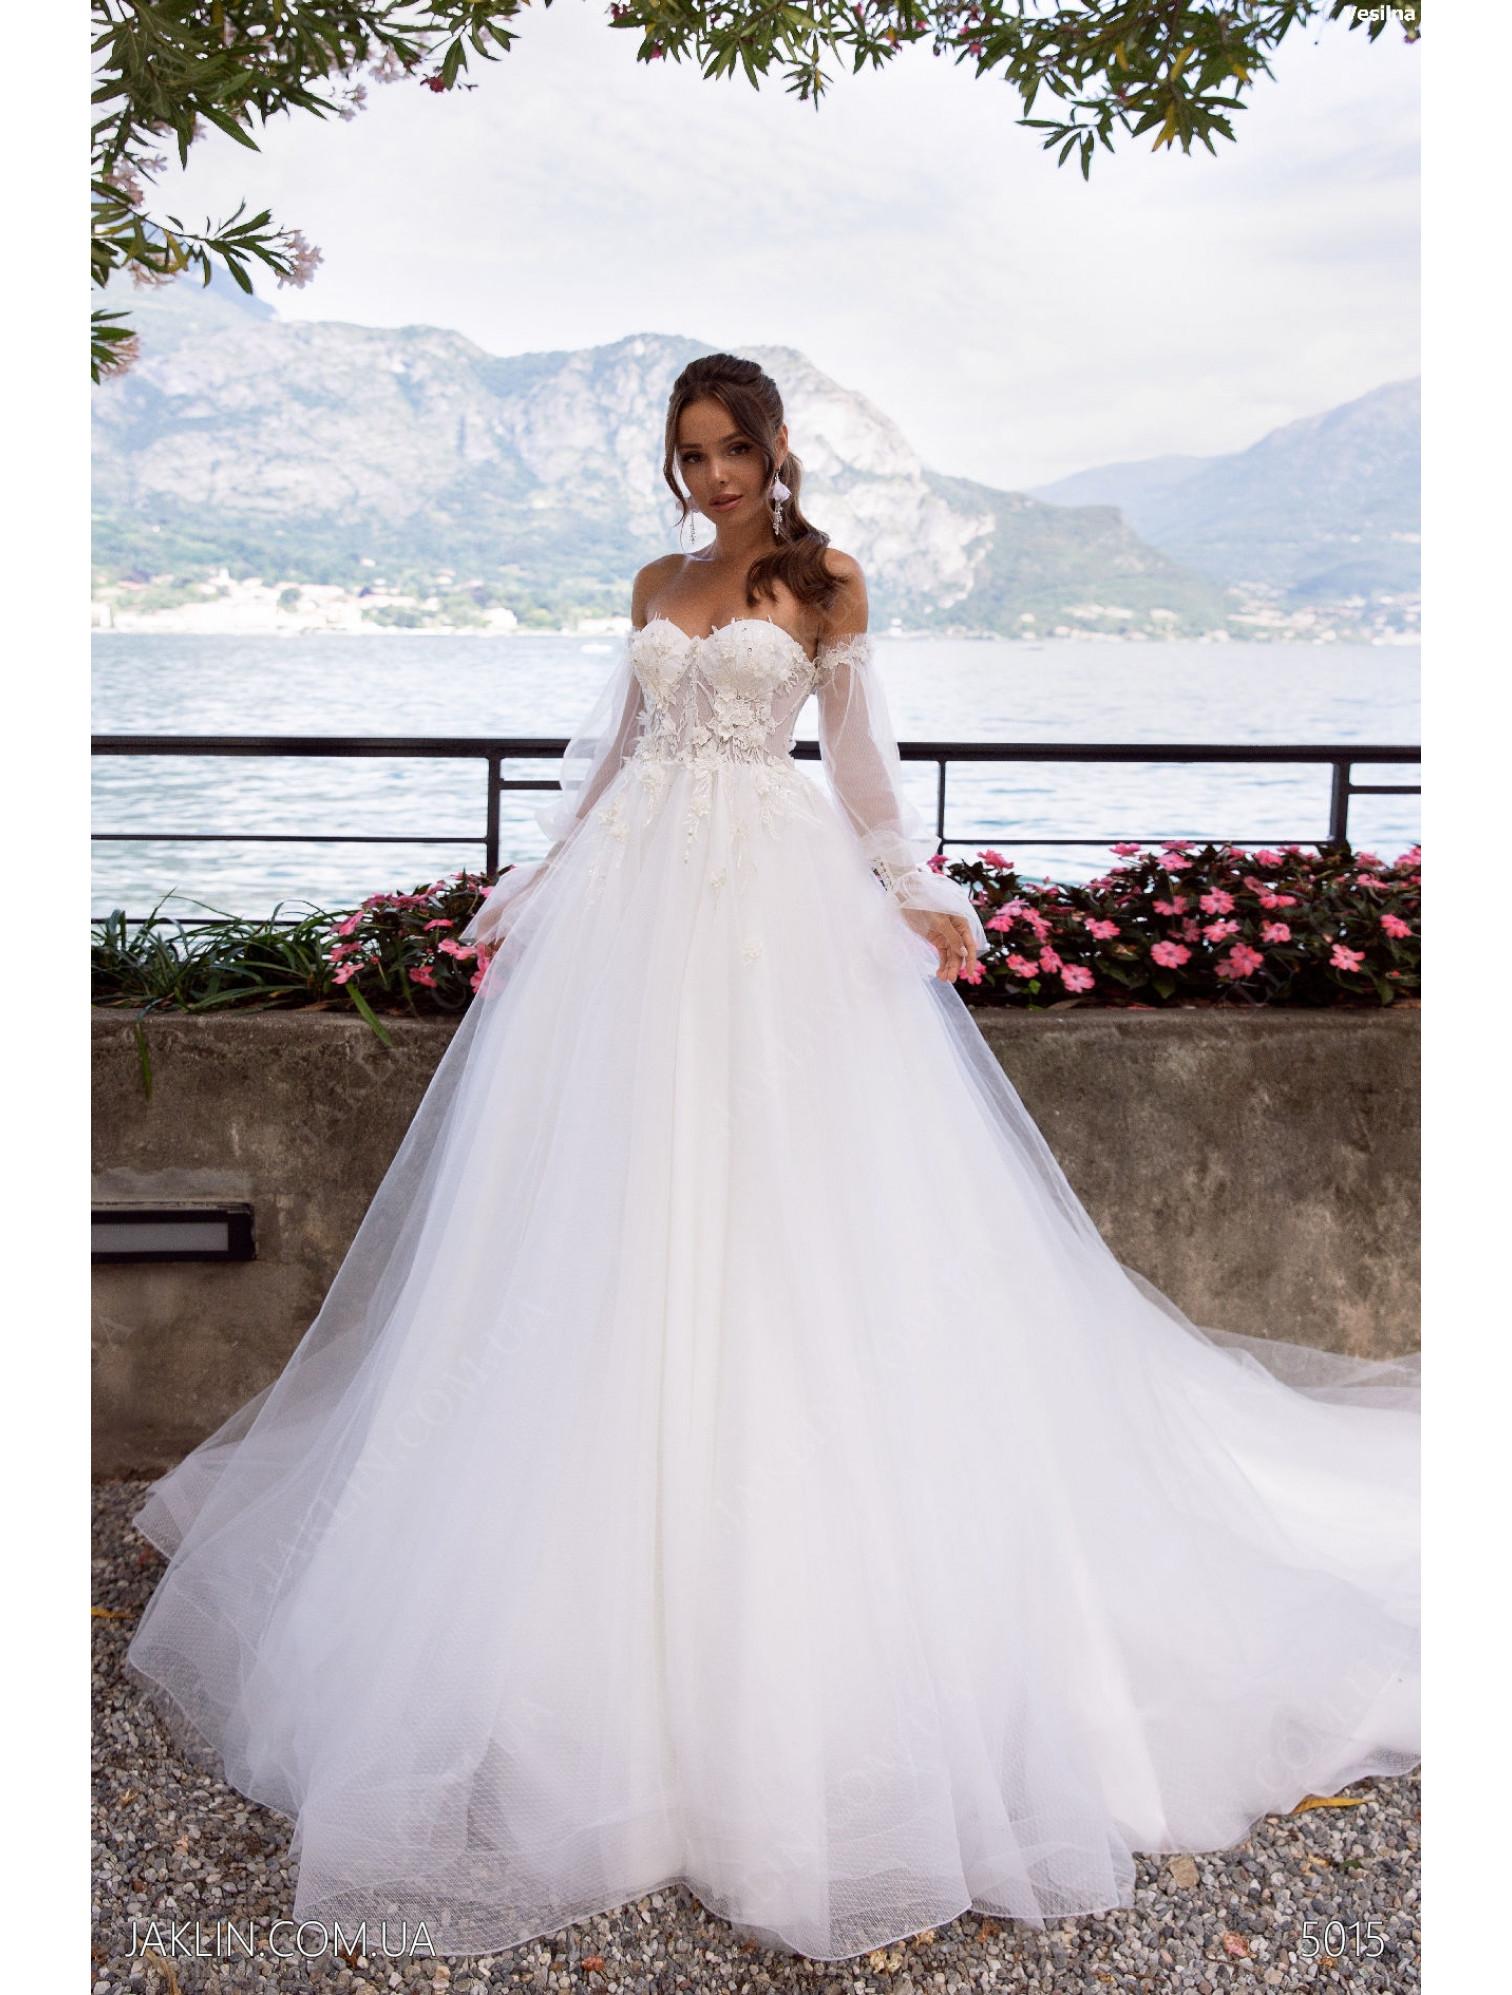 Wedding dress 5015